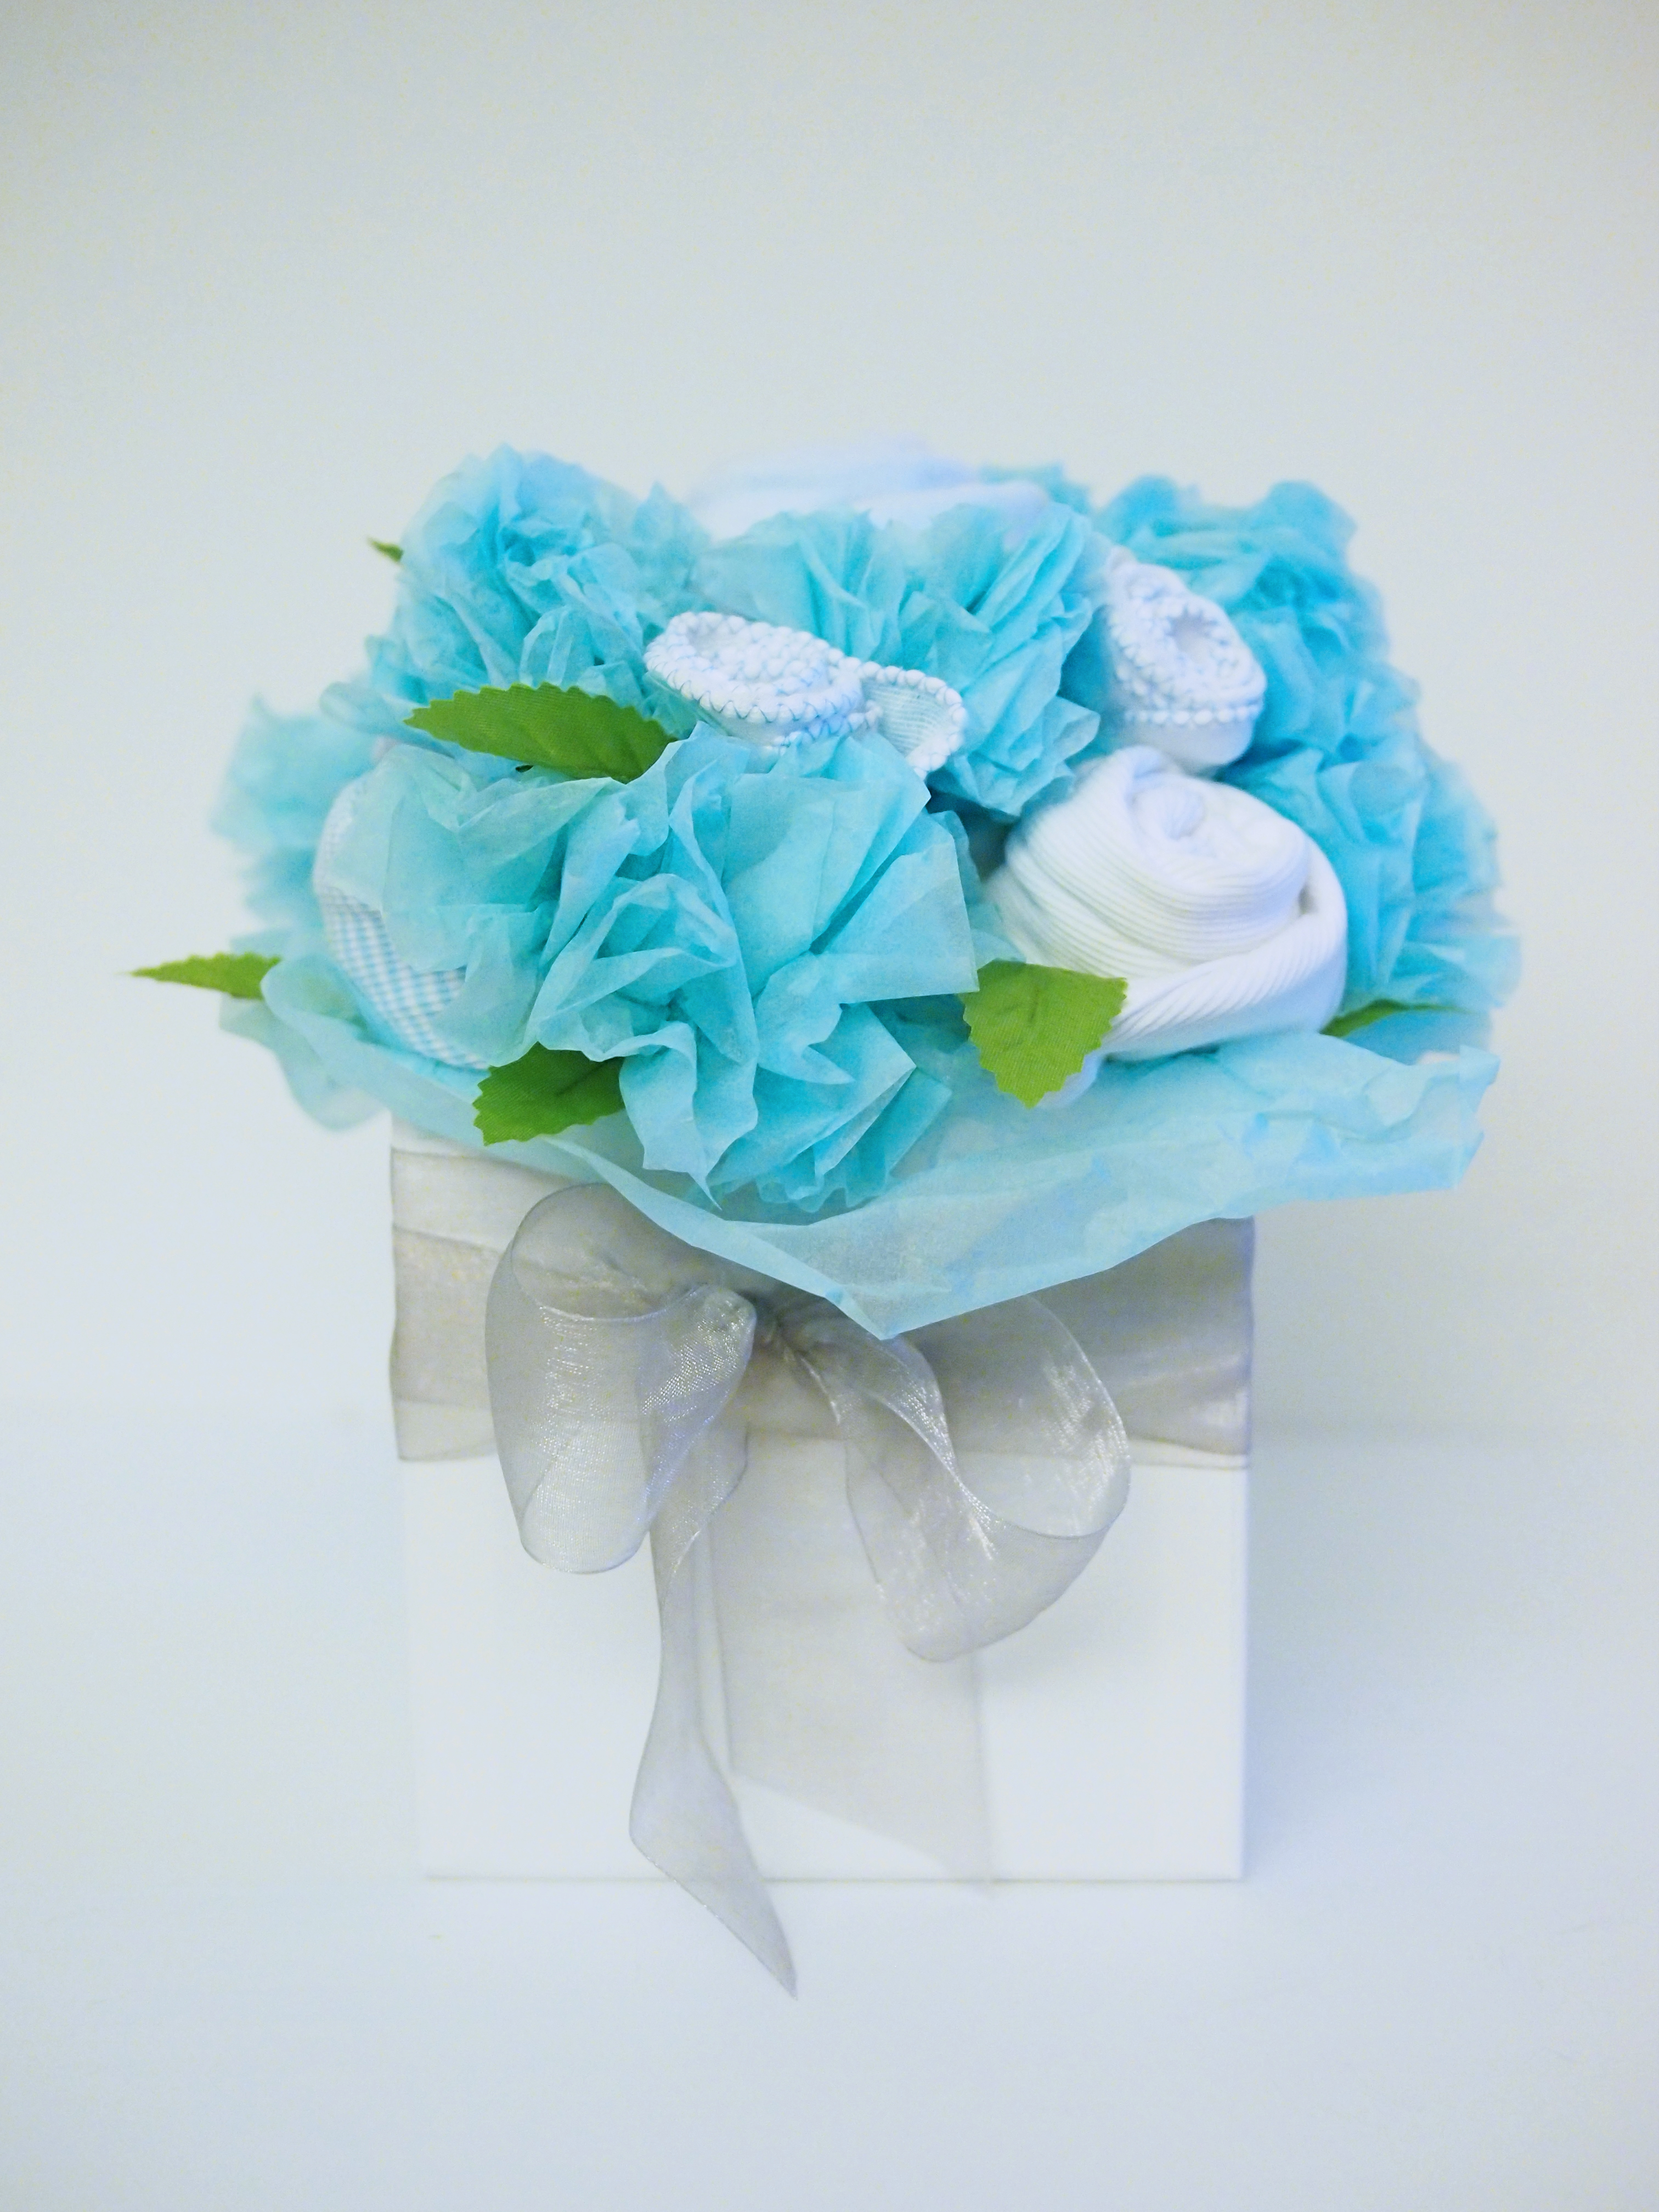 Diy baby shower bouquet olympus digital camera izmirmasajfo